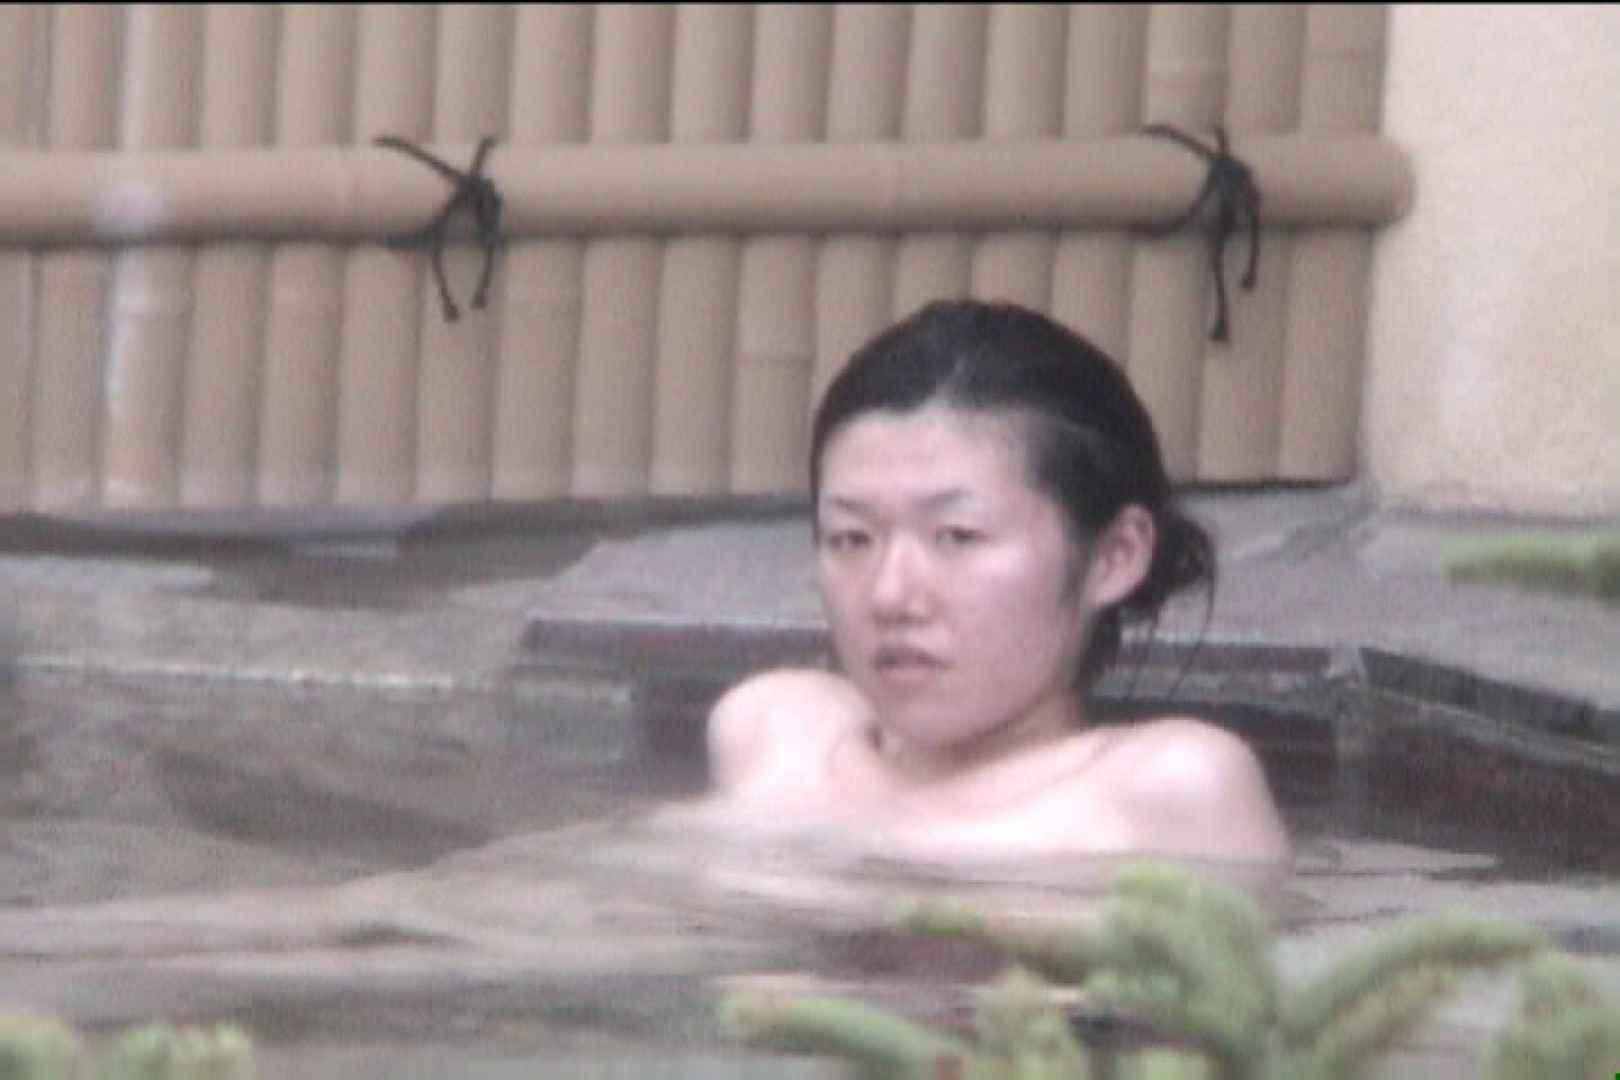 Aquaな露天風呂Vol.93【VIP限定】 盗撮シリーズ   露天風呂編  76PIX 63